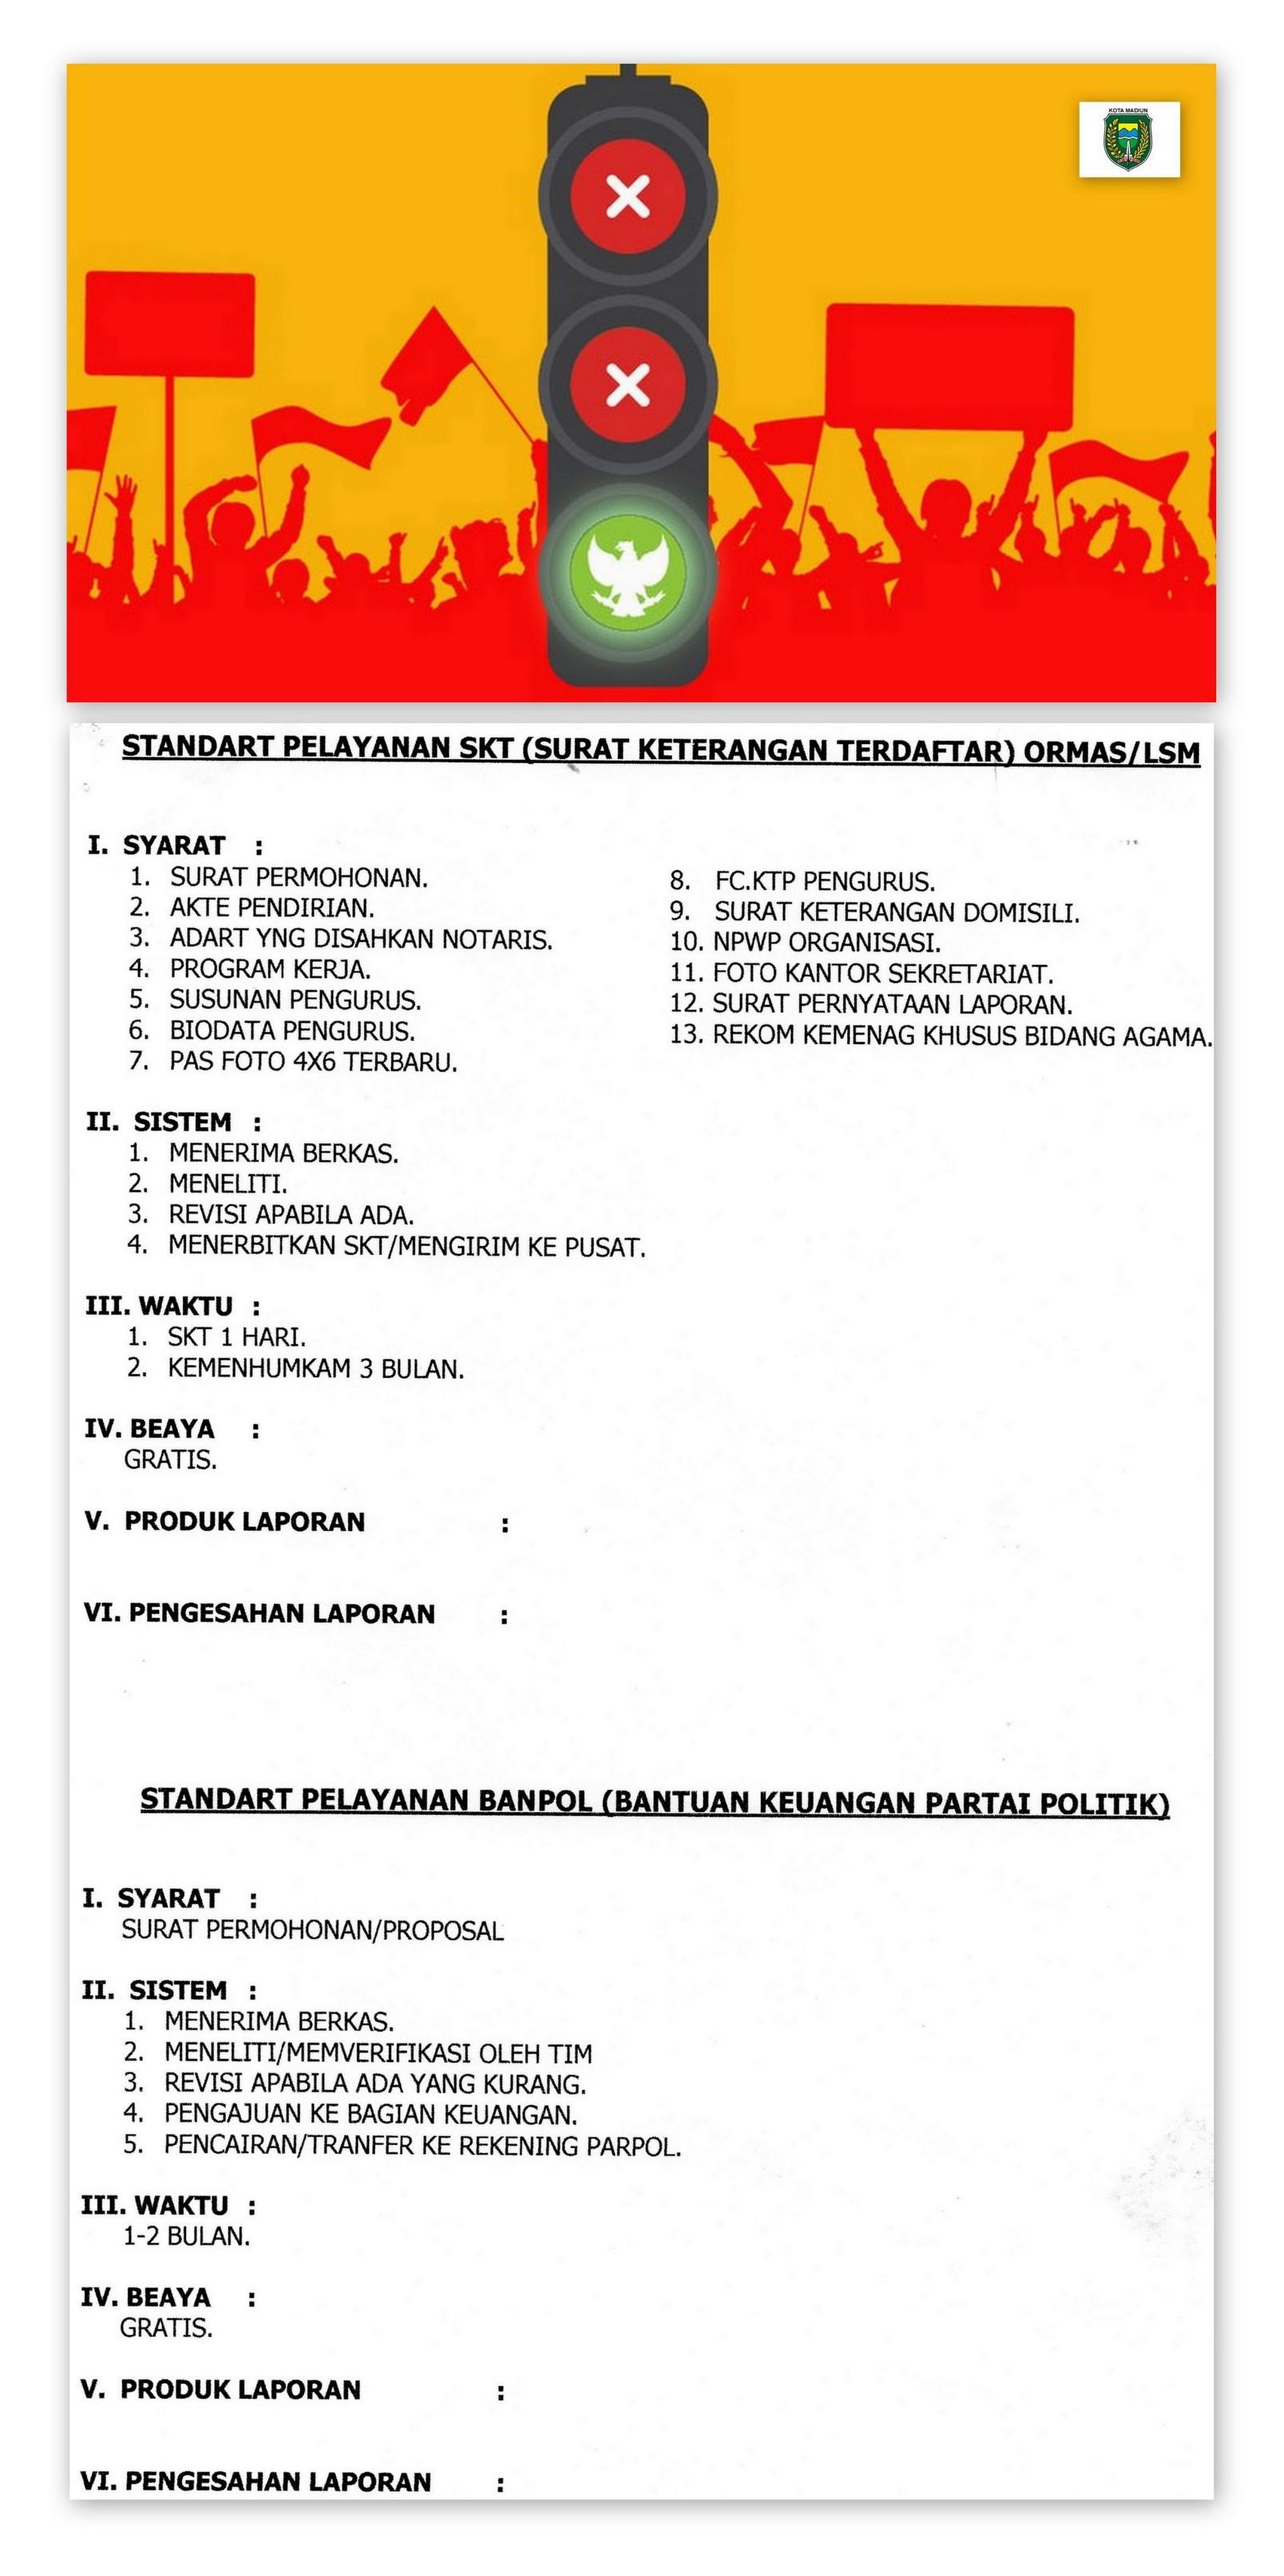 STANDAR PELAYANAN SKT (SURAT KETERANGAN TERDAFTAR) ORMAS/LSM